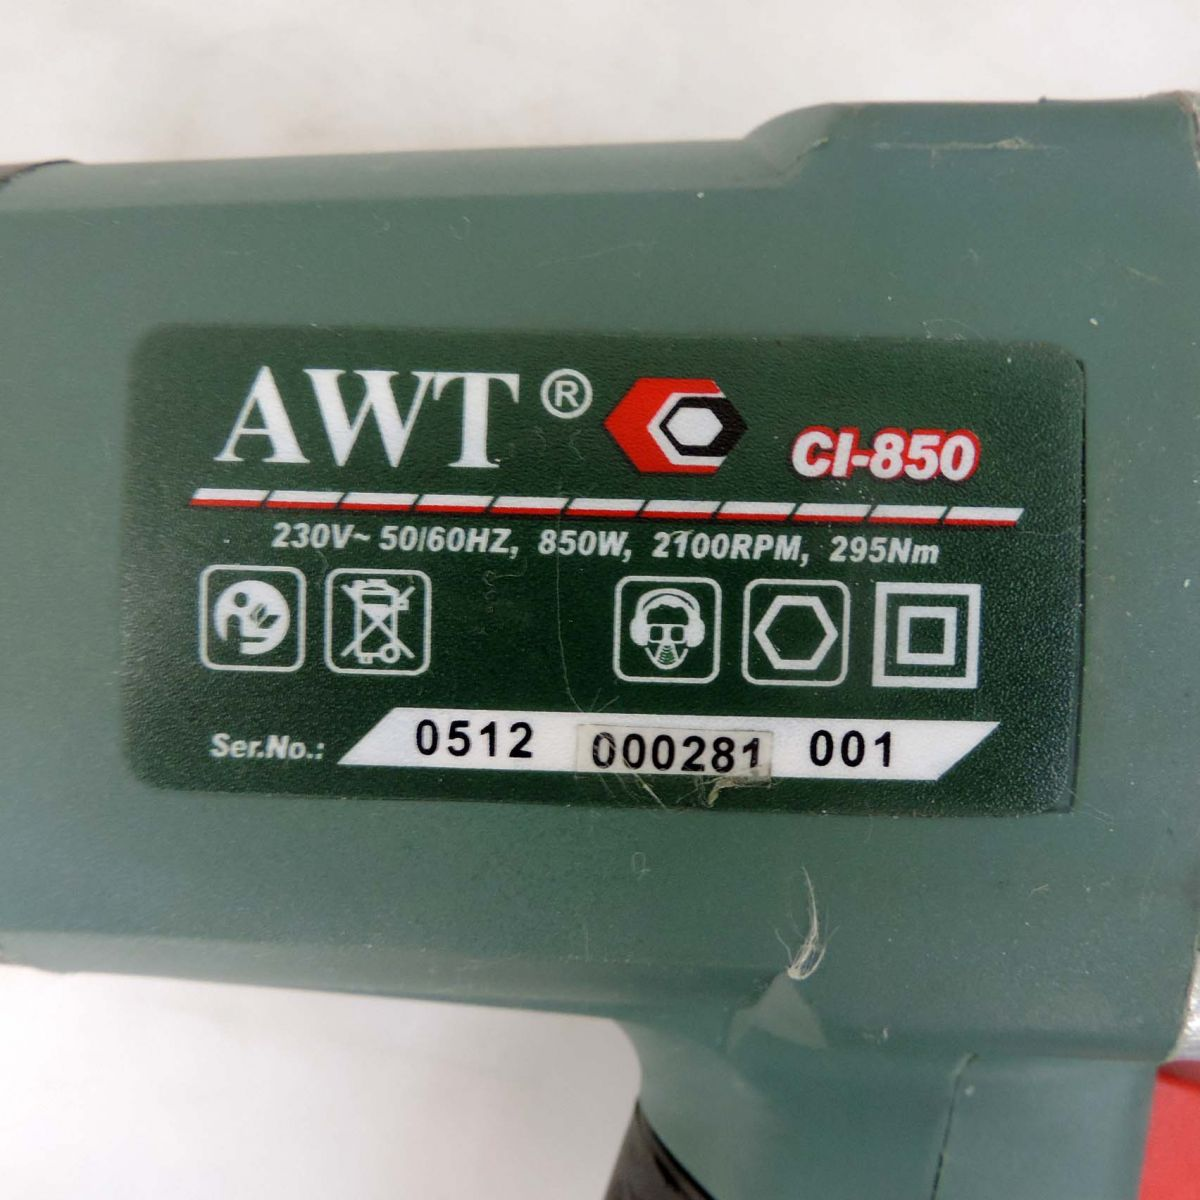 Chave De Impacto 220v Modelo Ci-850 Awt - SEMI NOVA